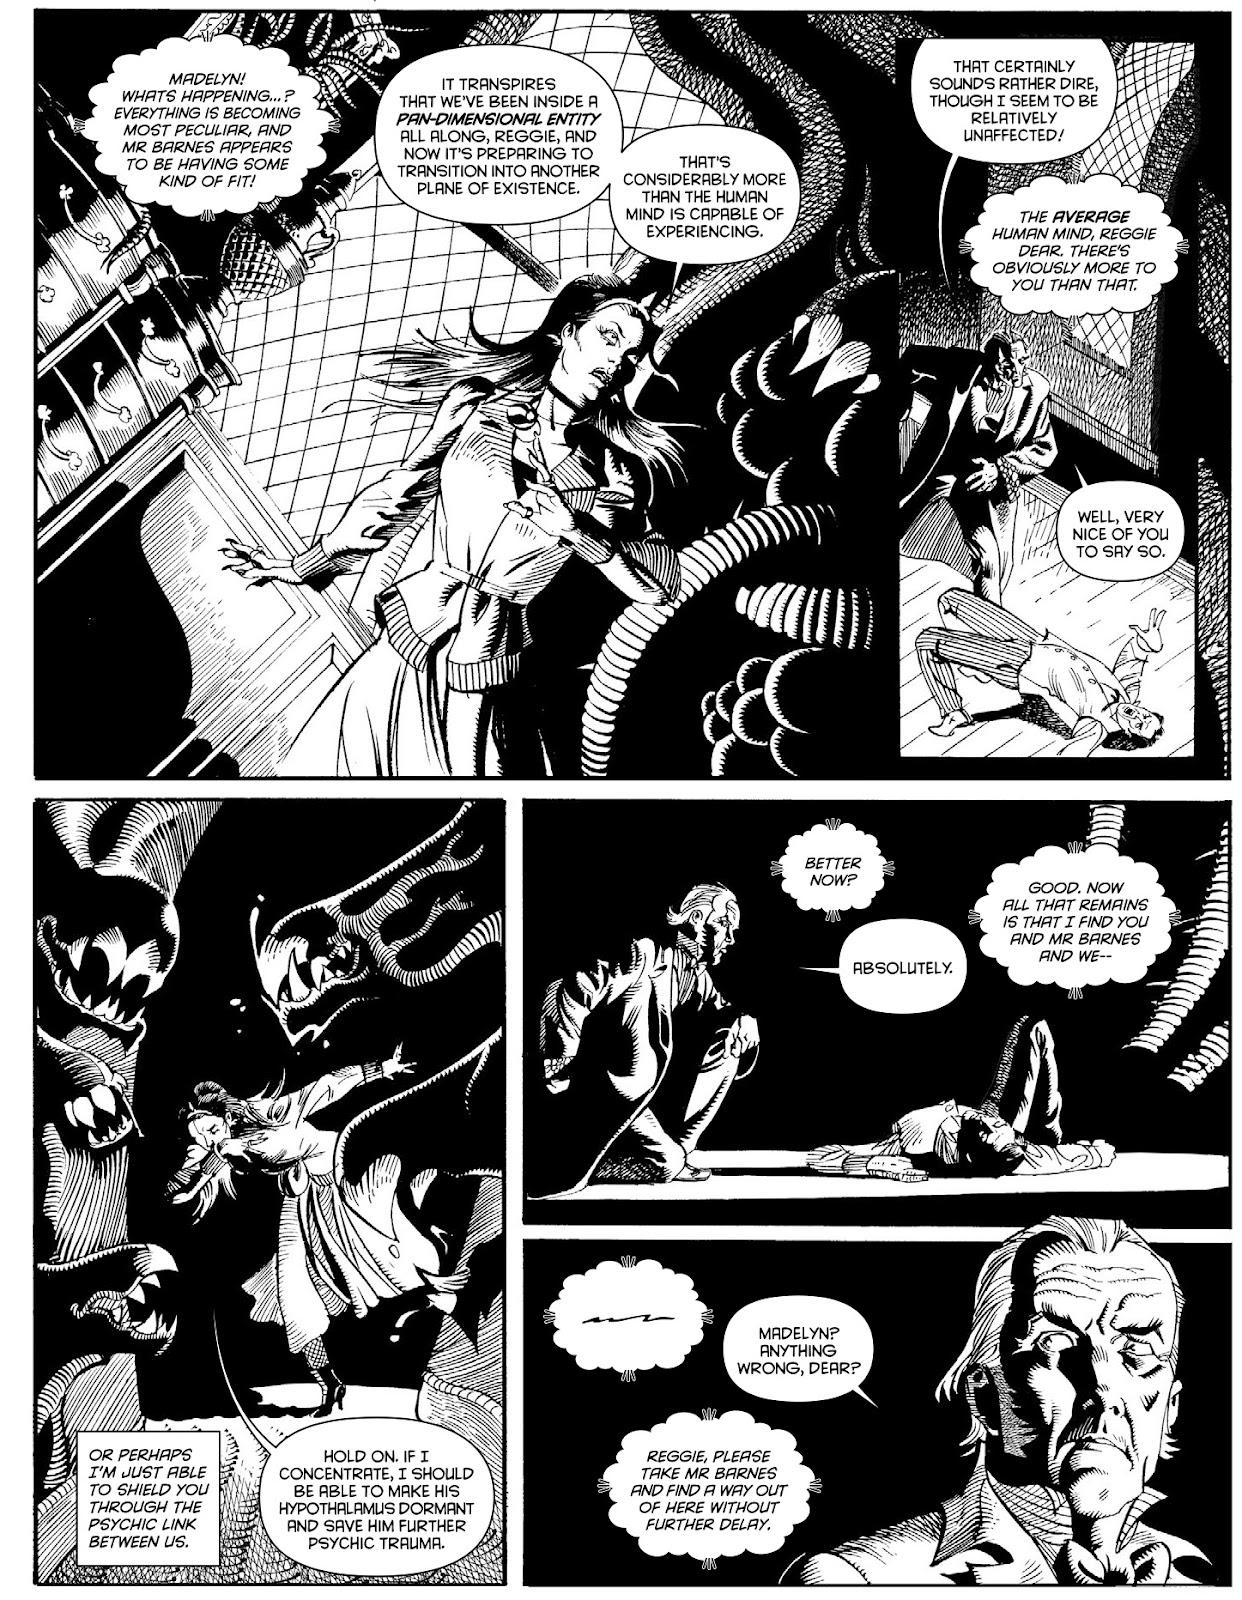 Judge Dredd Megazine (Vol. 5) issue 427 - Page 104